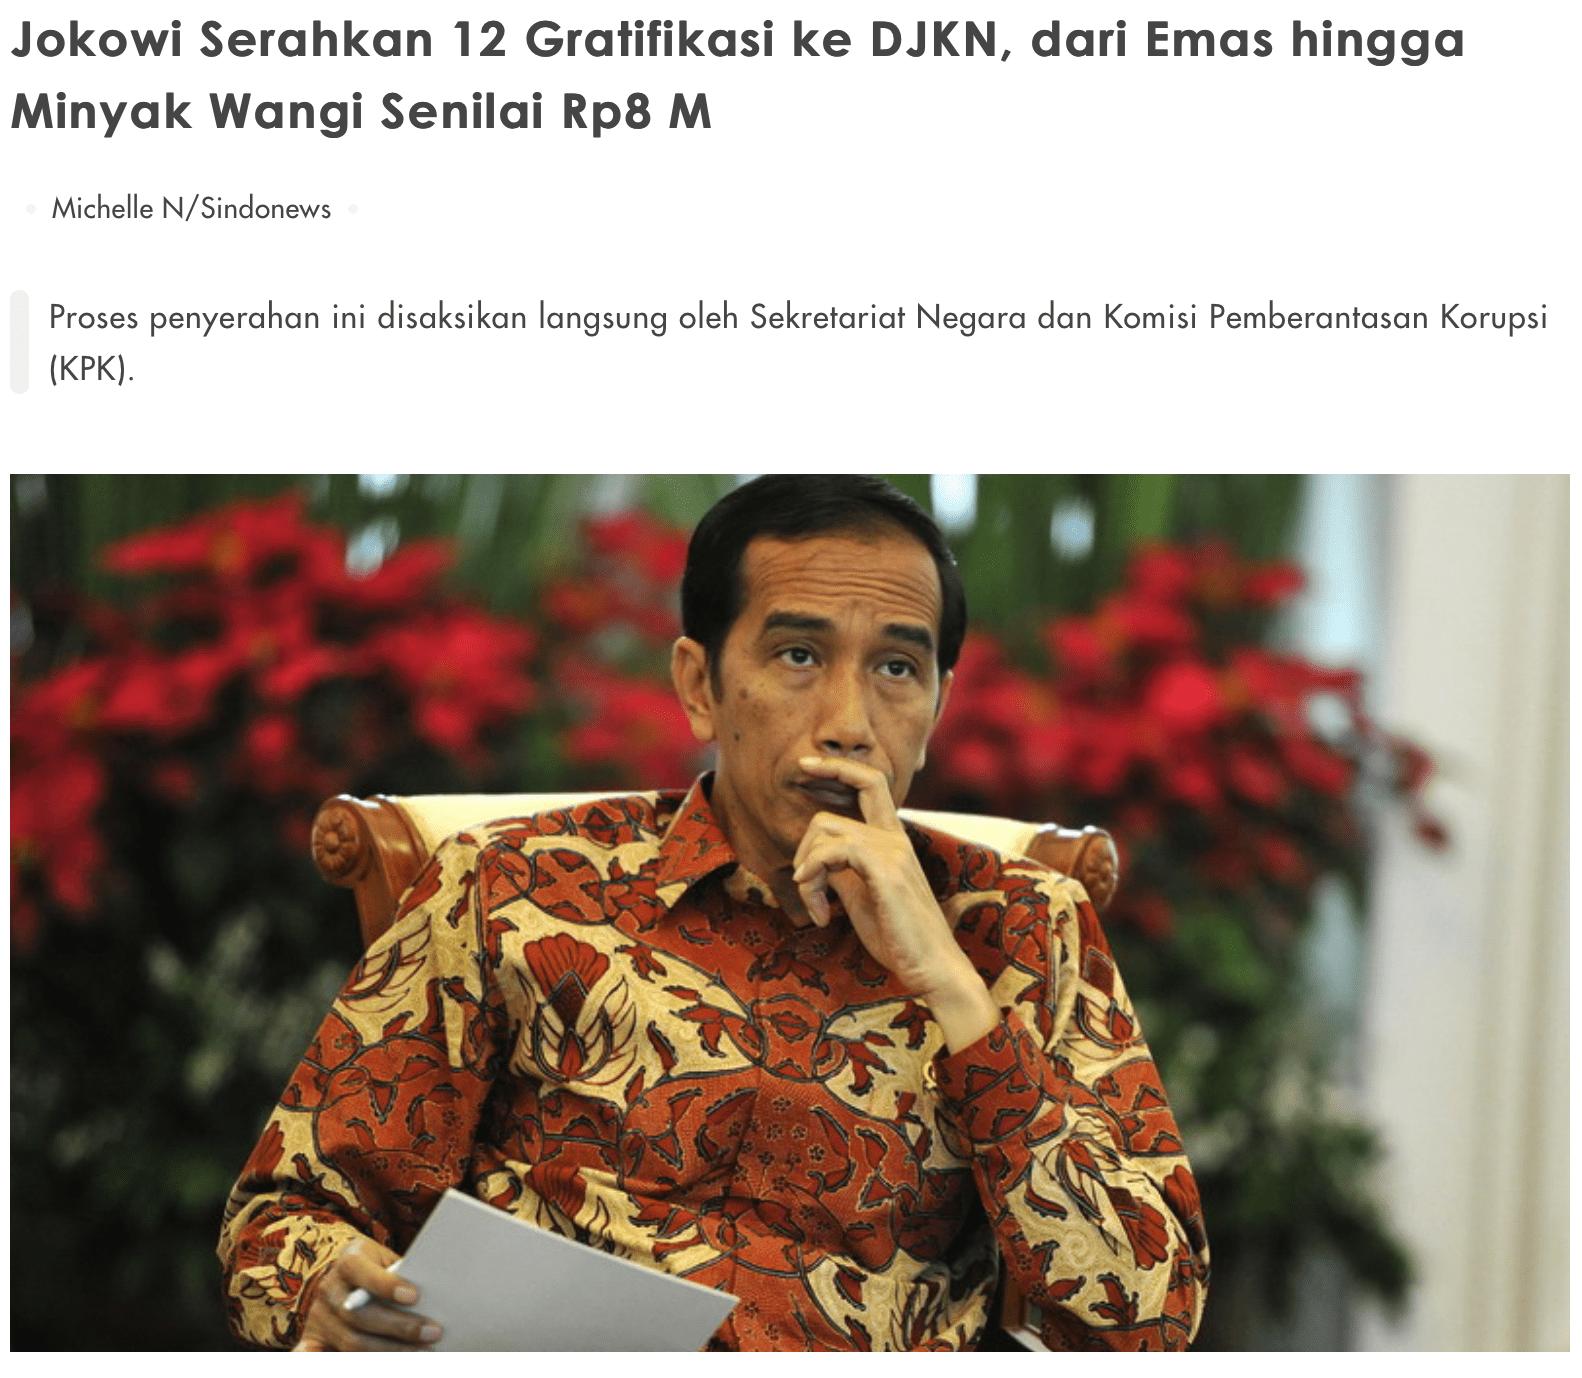 Jokowi Serahkan 12 Gratifikasi ke DJKN, dari Emas hingga Minyak Wangi Senilai Rp8 M